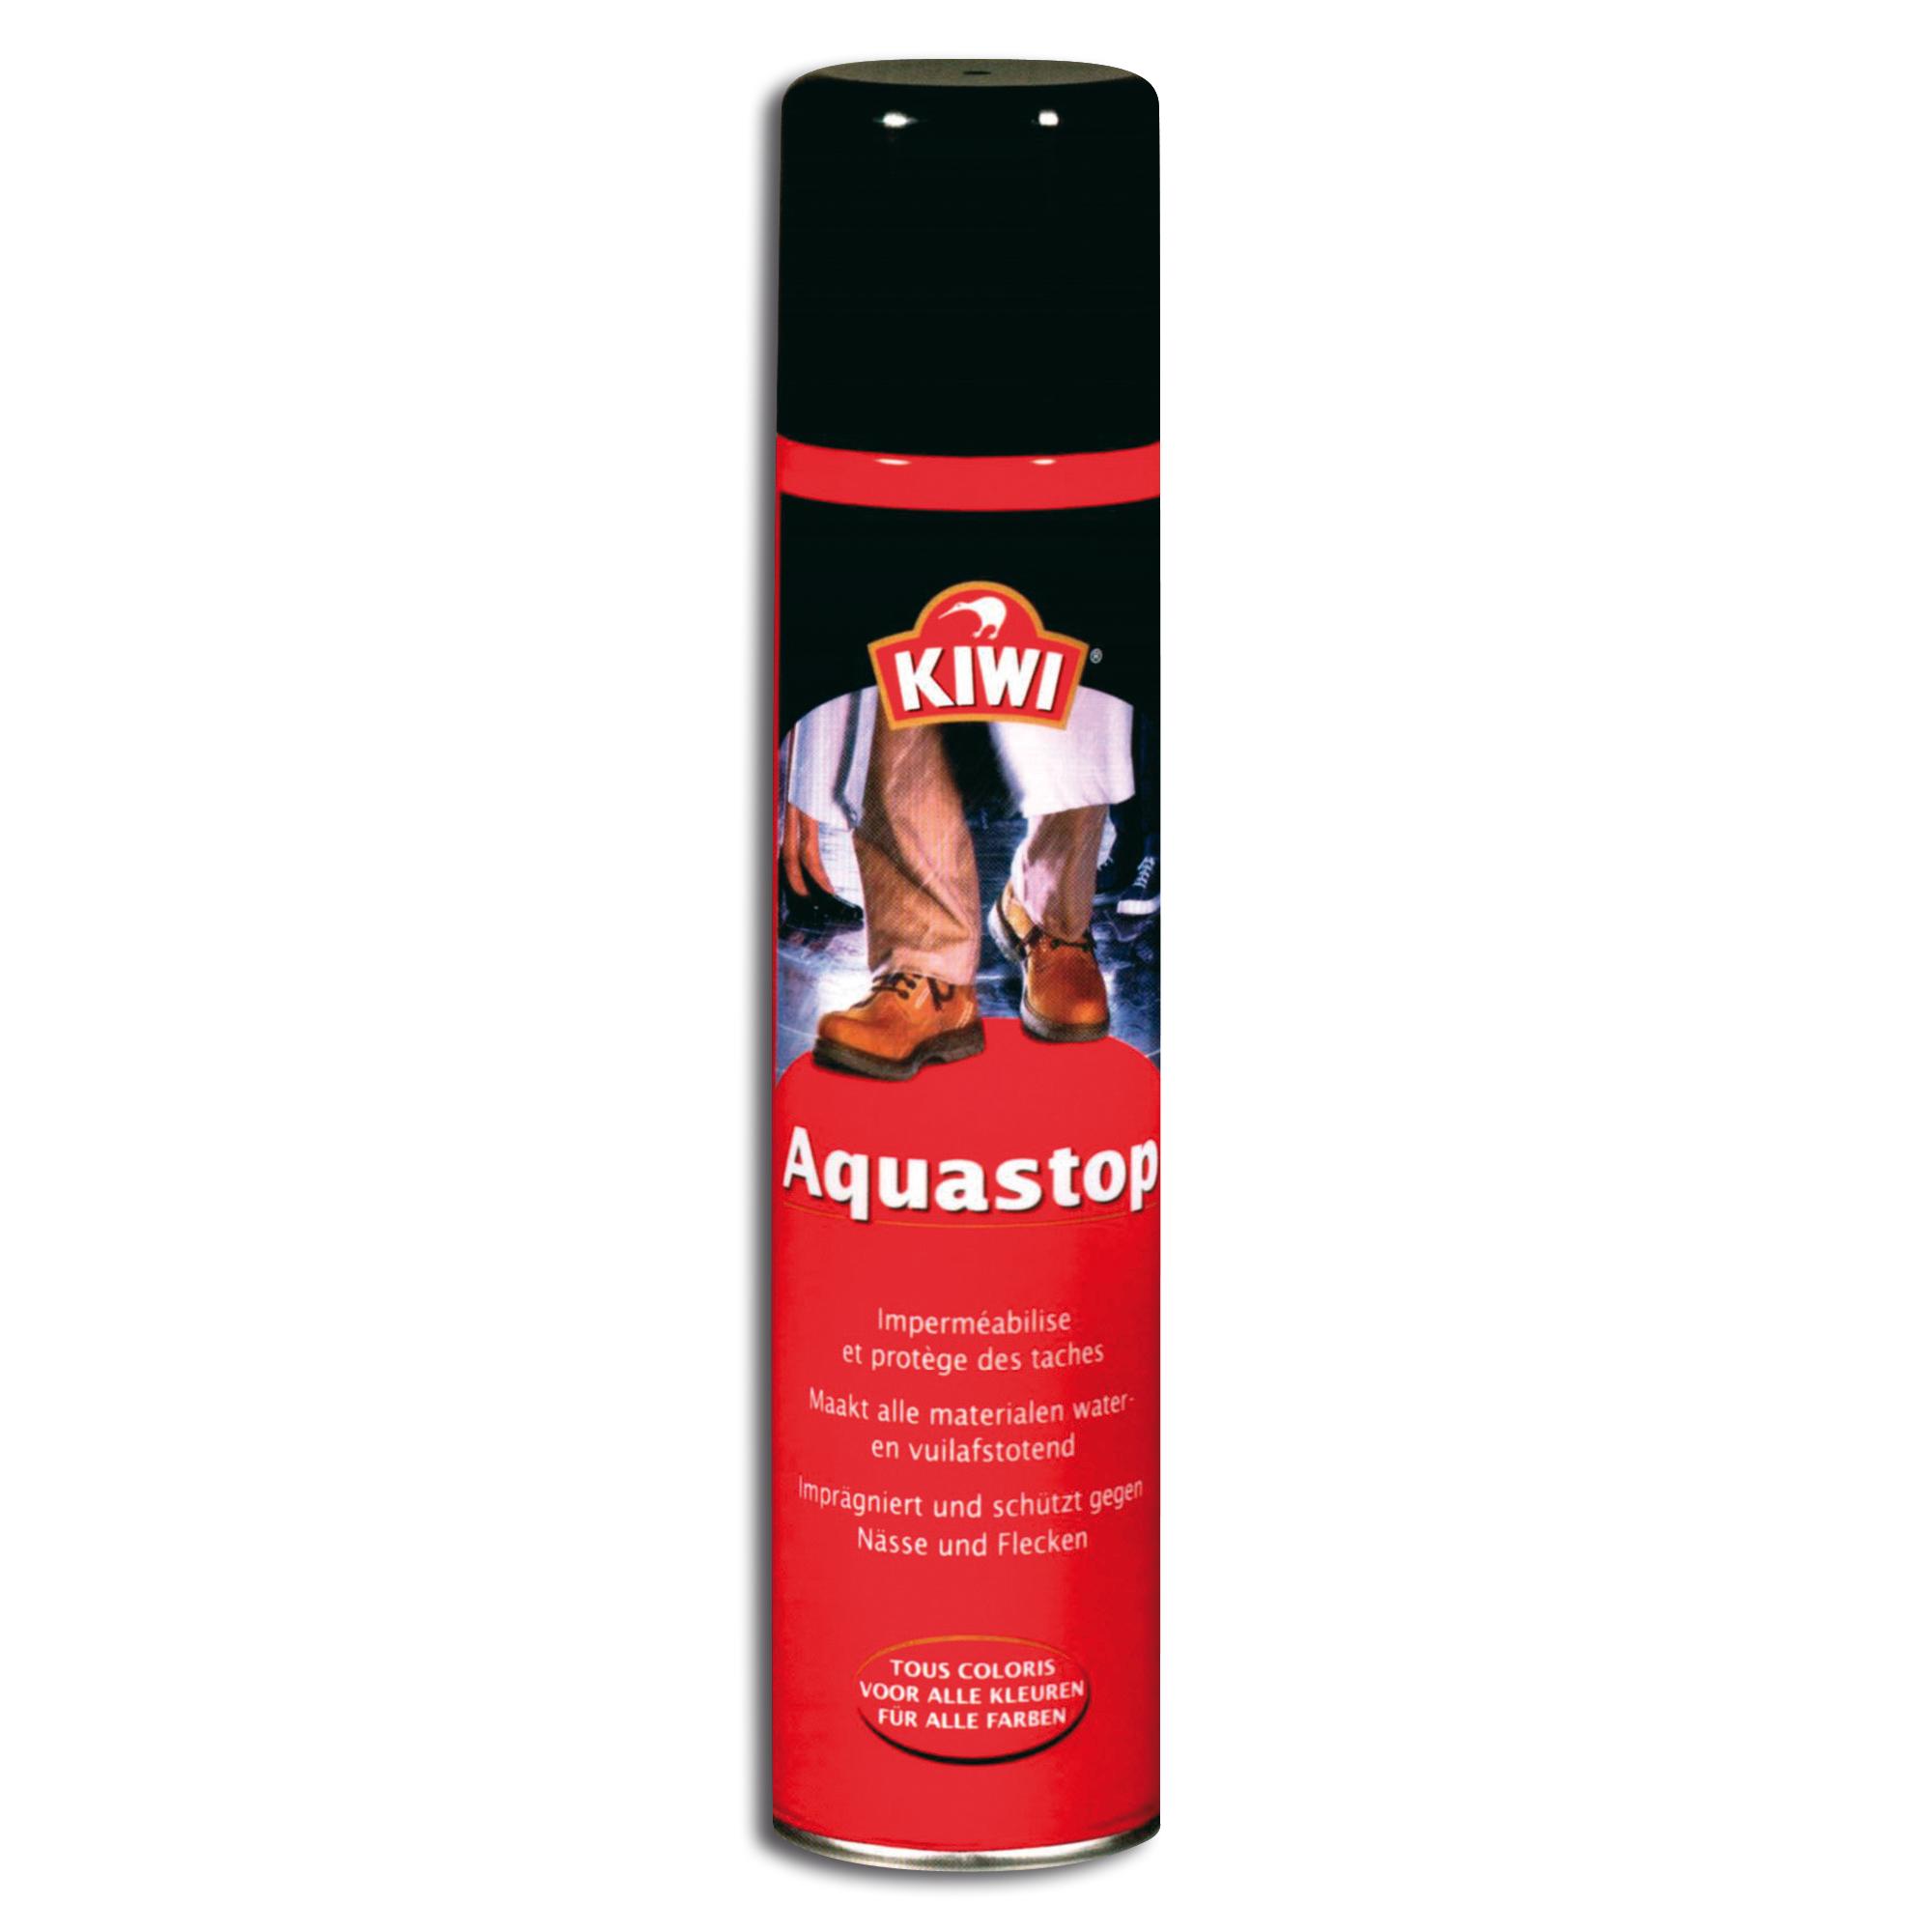 KIWI Aquastop 400 ml